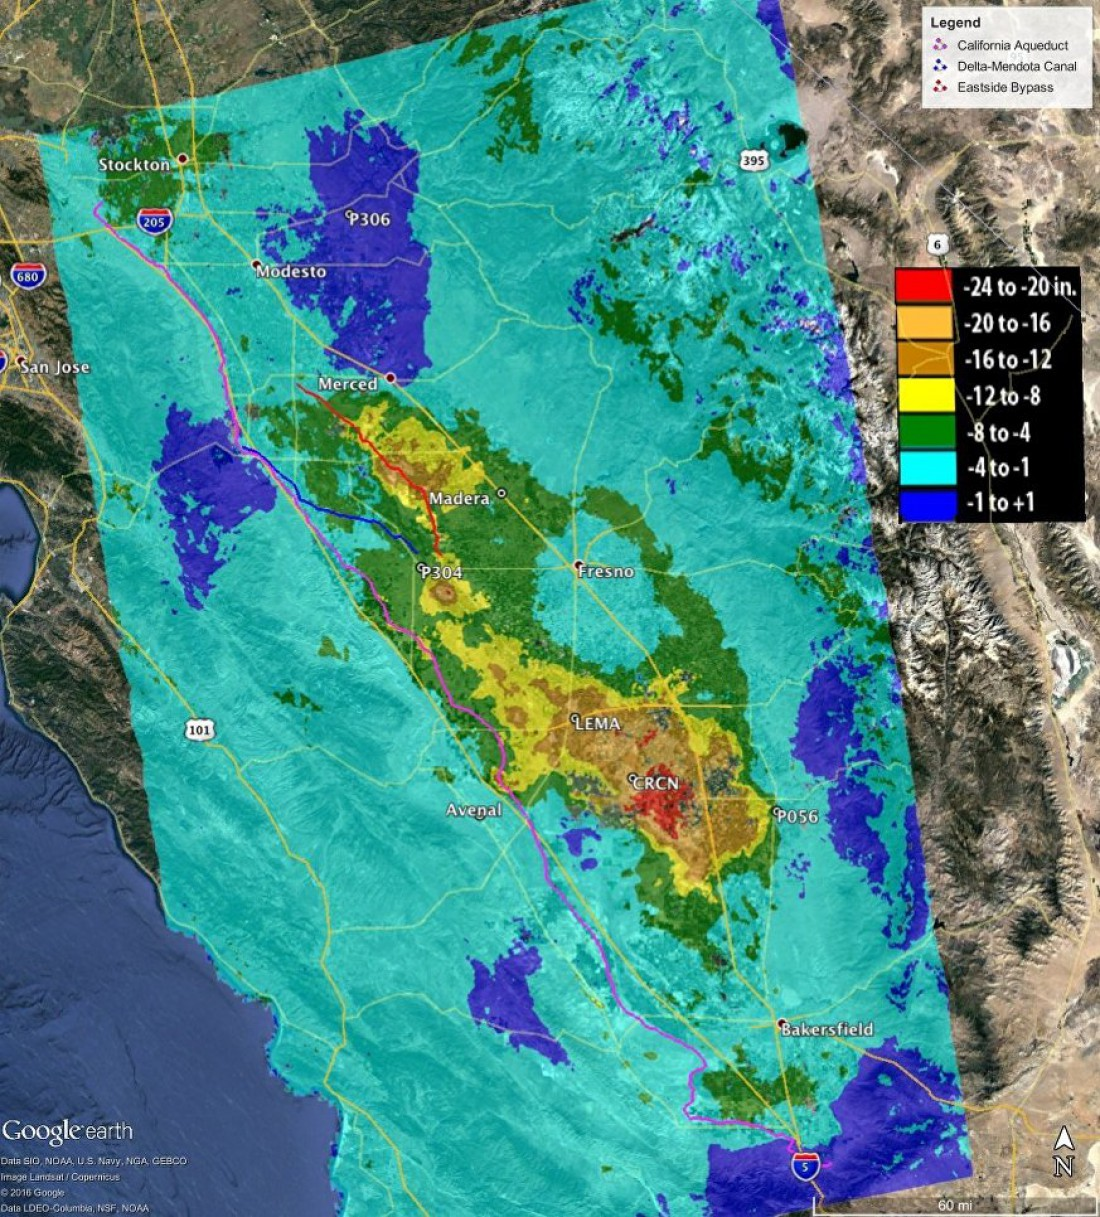 Карта скорости просадки грунта на территории Калифорнии